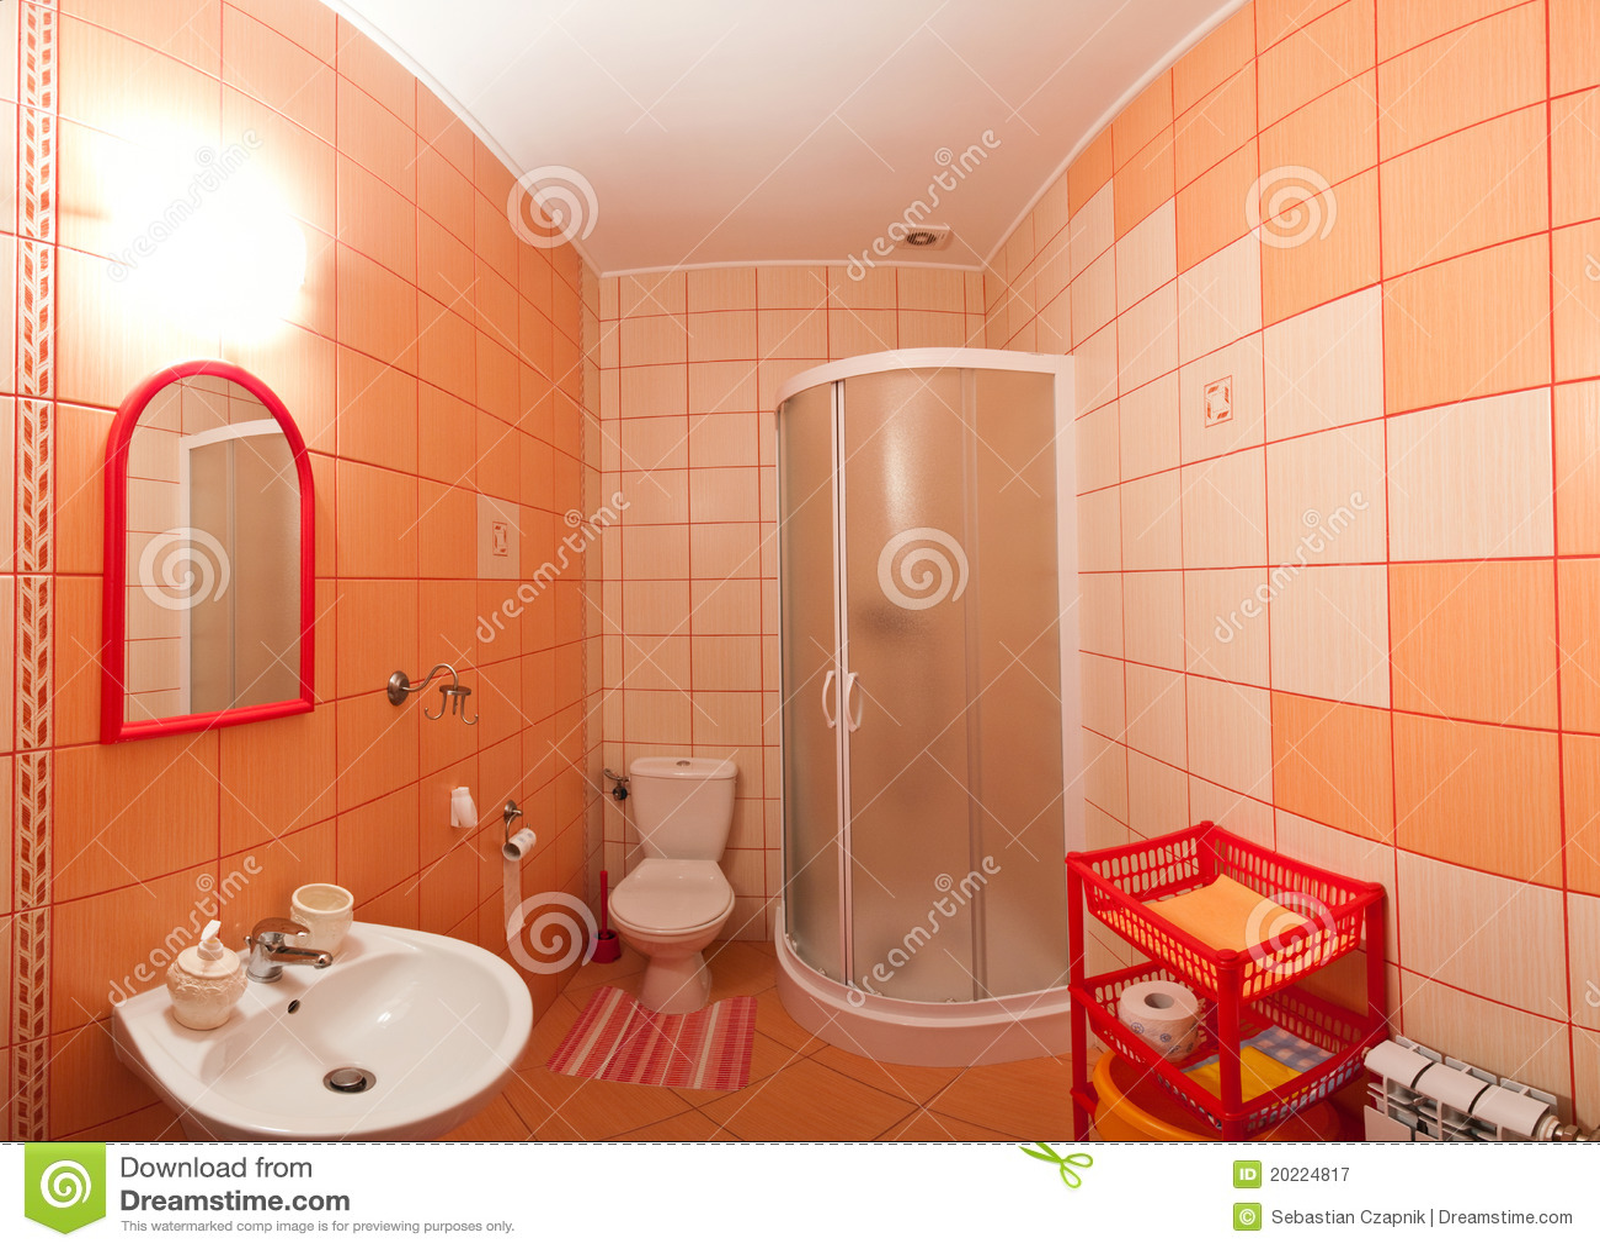 cuarto de ba o anaranjado fotograf a de archivo libre de regal as imagen 20224817. Black Bedroom Furniture Sets. Home Design Ideas